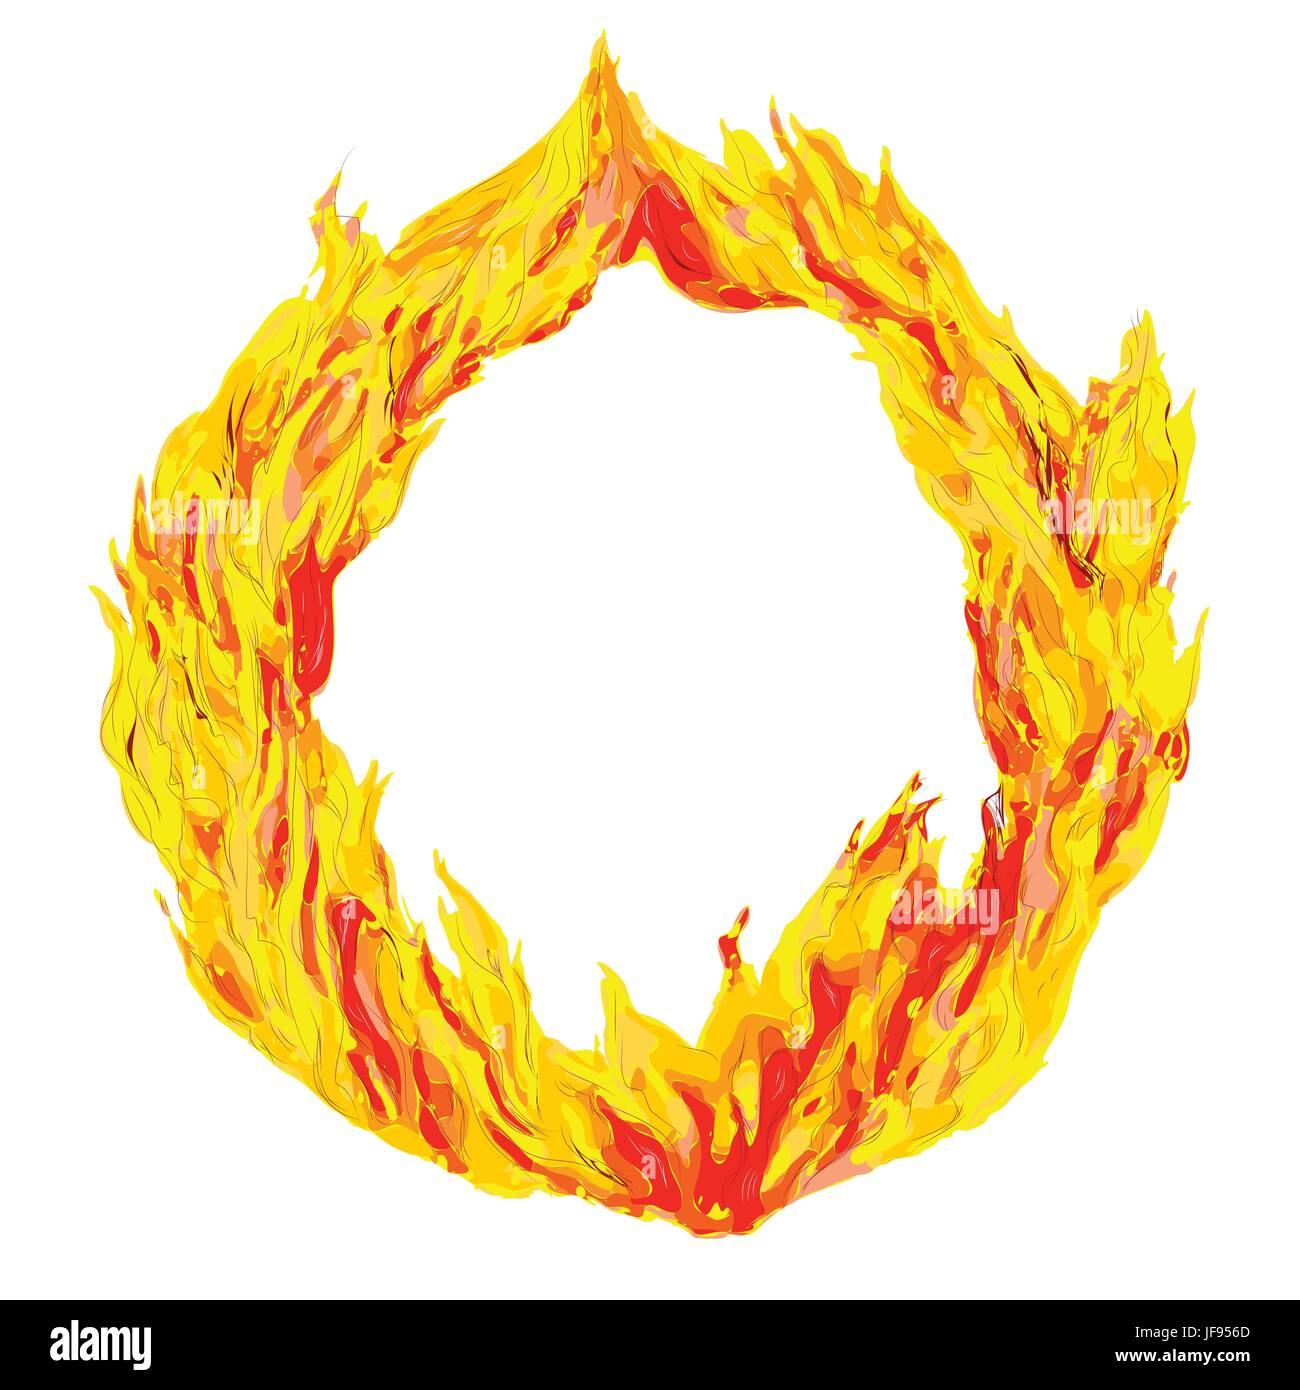 fire circle - Stock Image